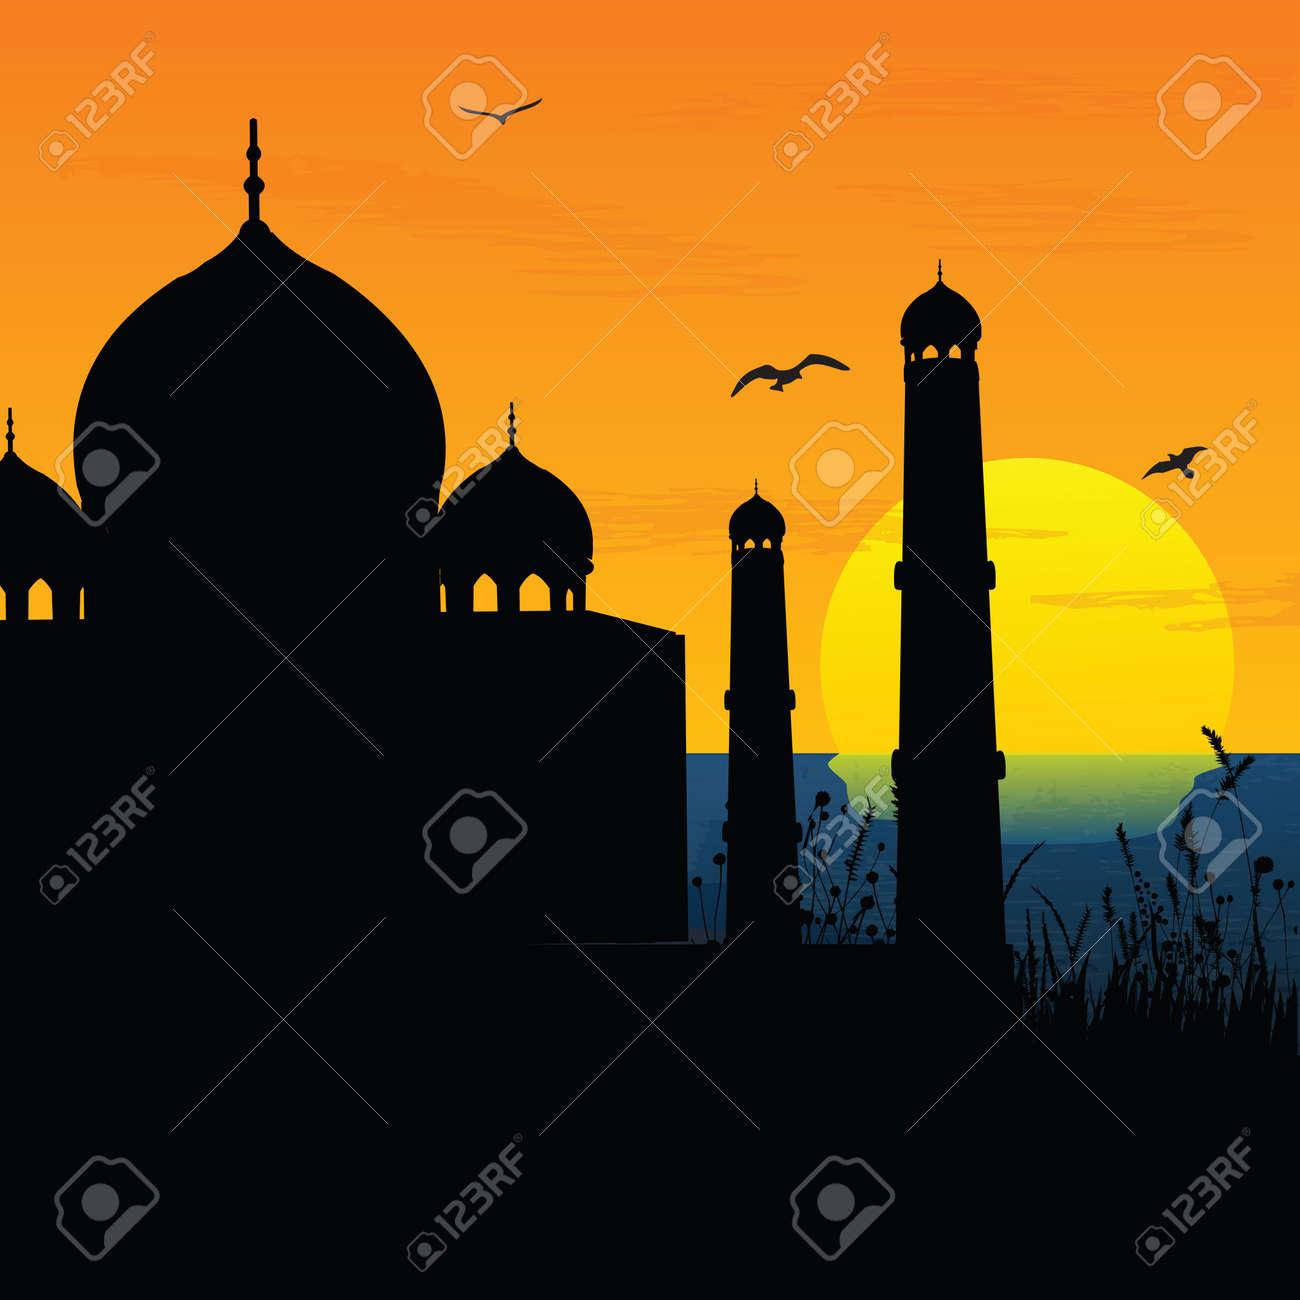 Silhouette View Of Taj Mahal Agra India Sunrise Sunset